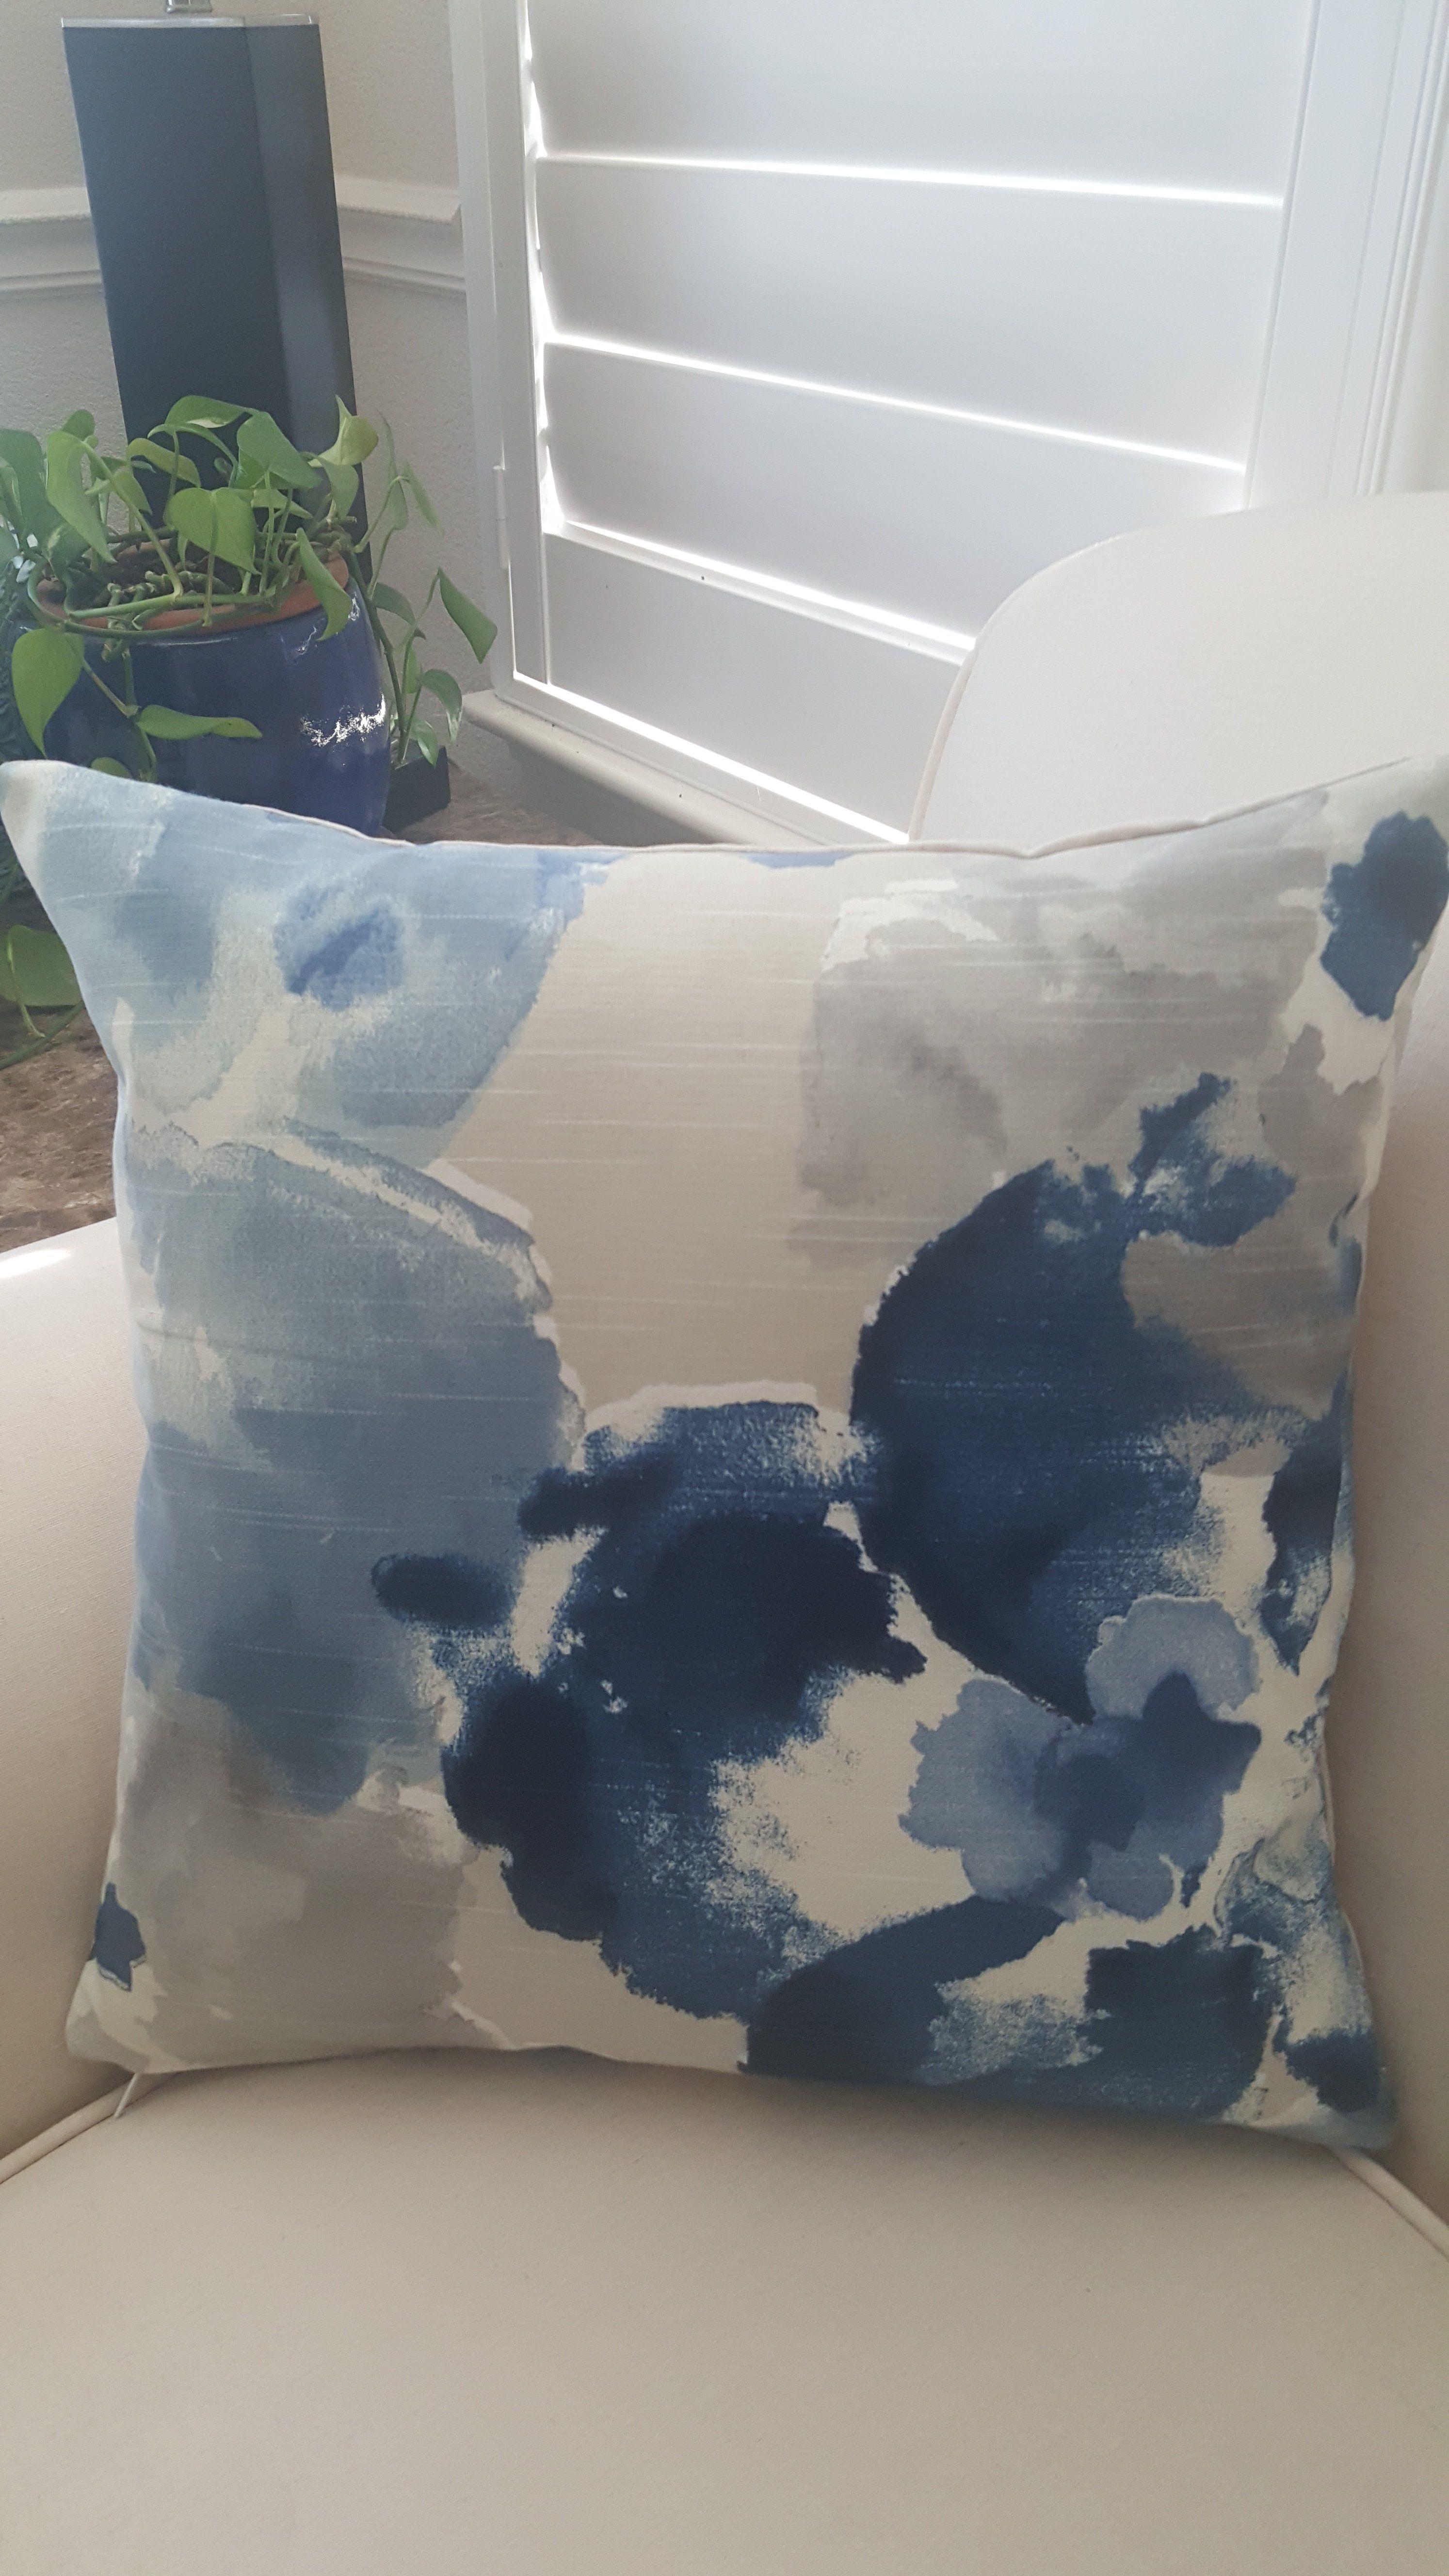 FAST SHIPPING Robert Allen Aptura Indigo Indoor Pillow Cover with Zipper - 14x14 inches